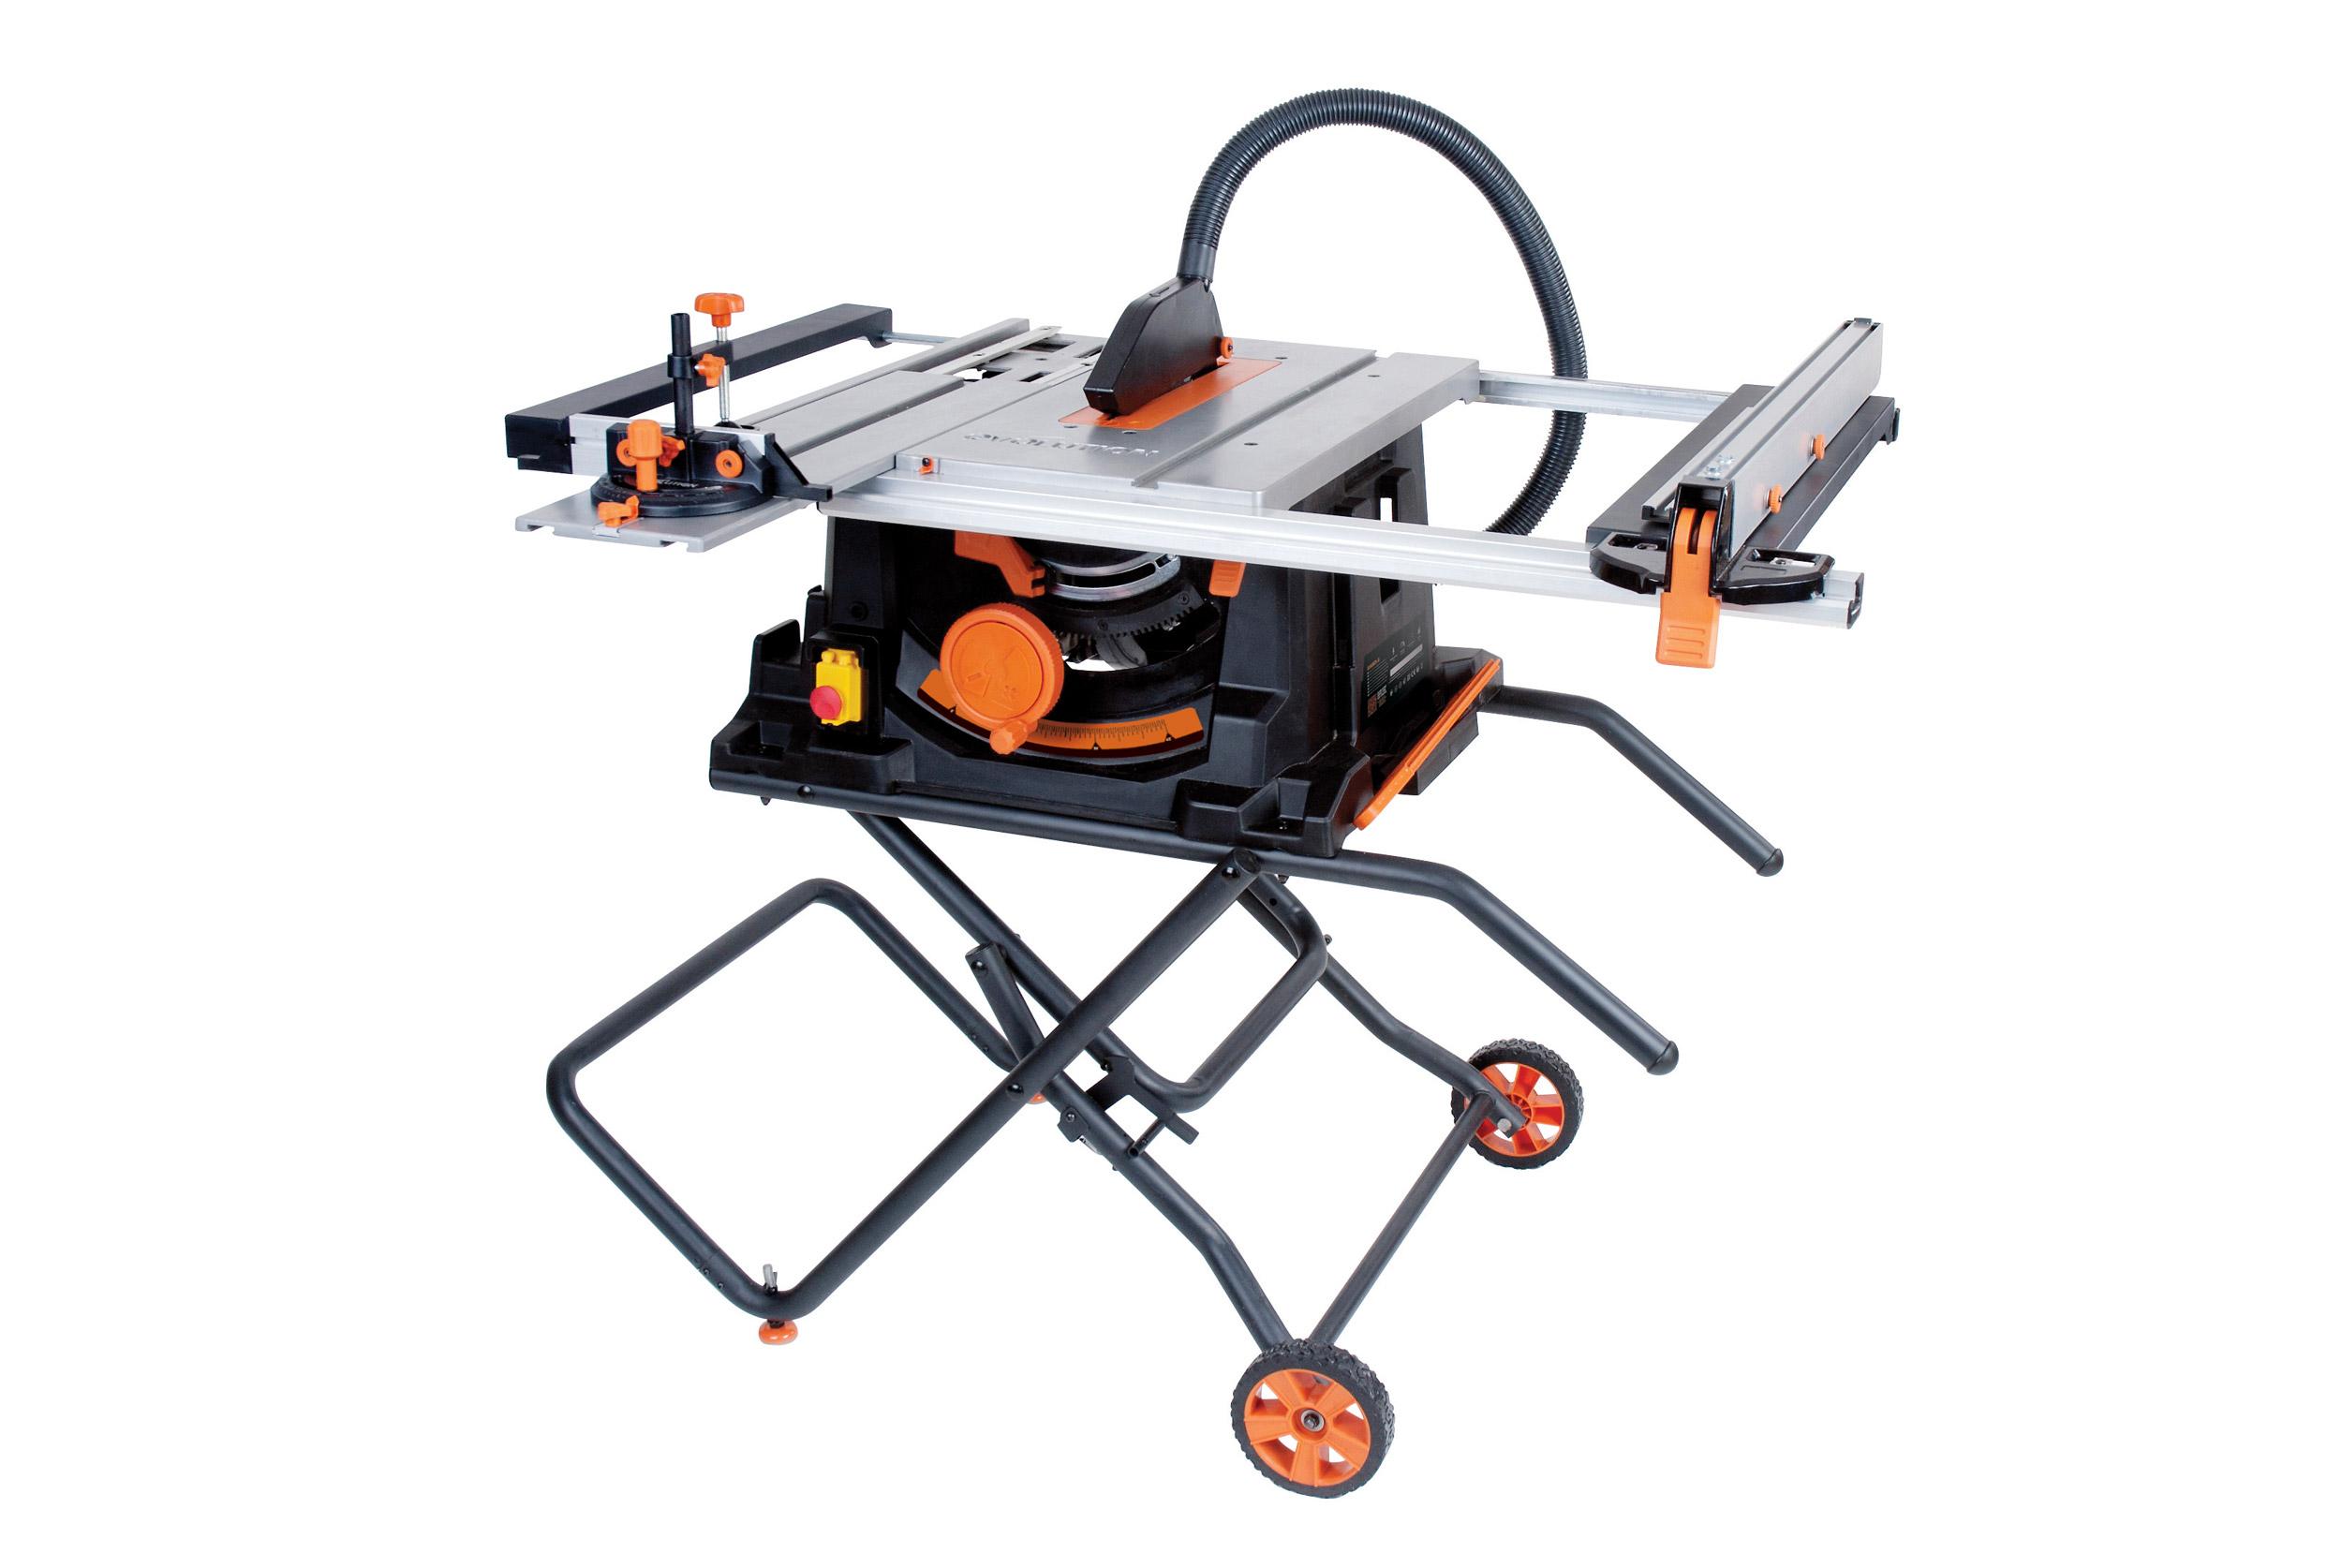 Rage5 s 255mm tct multipurpose table saw rage5 s 255mm multipurpose table saw greentooth Gallery